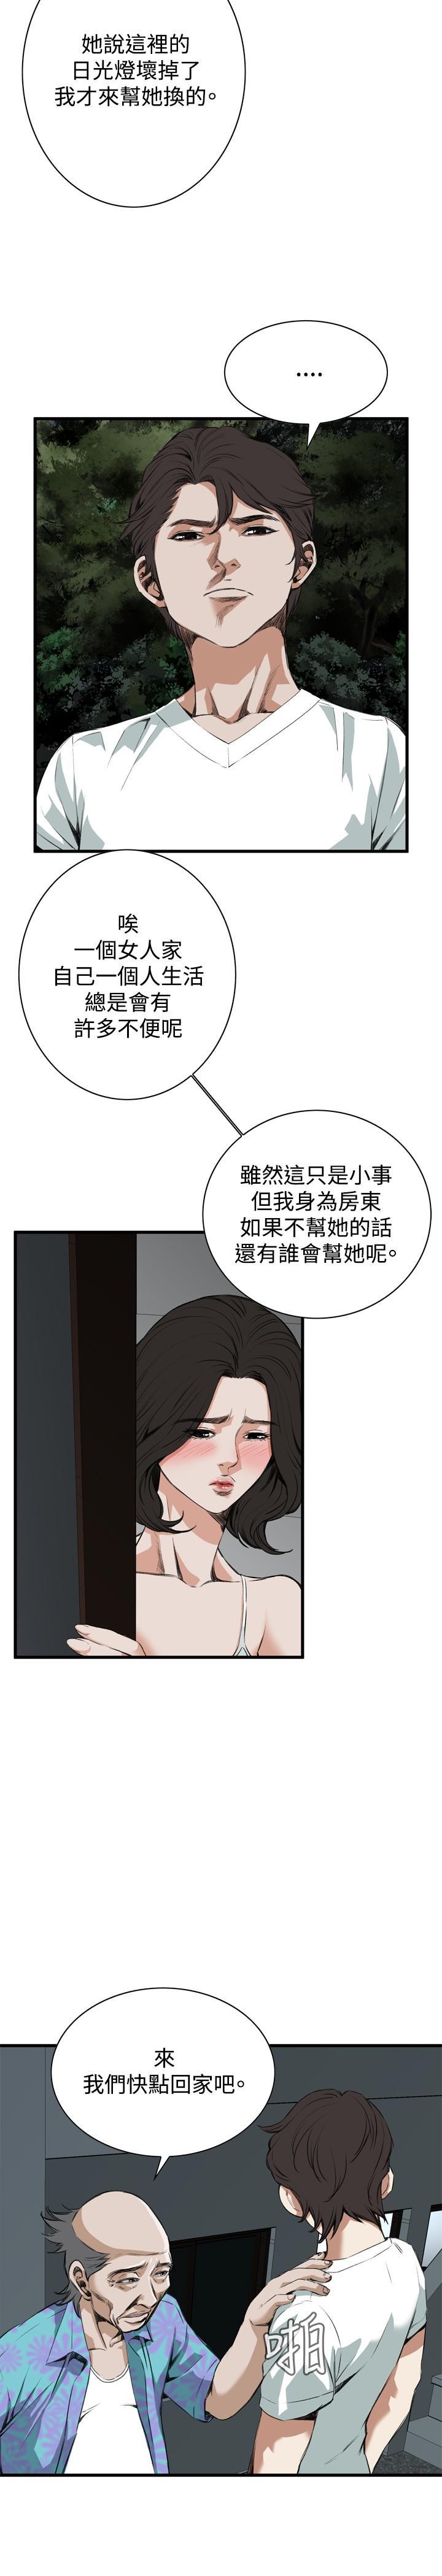 Take a Peek 偷窥 Ch.39~55 [Chinese]中文 208